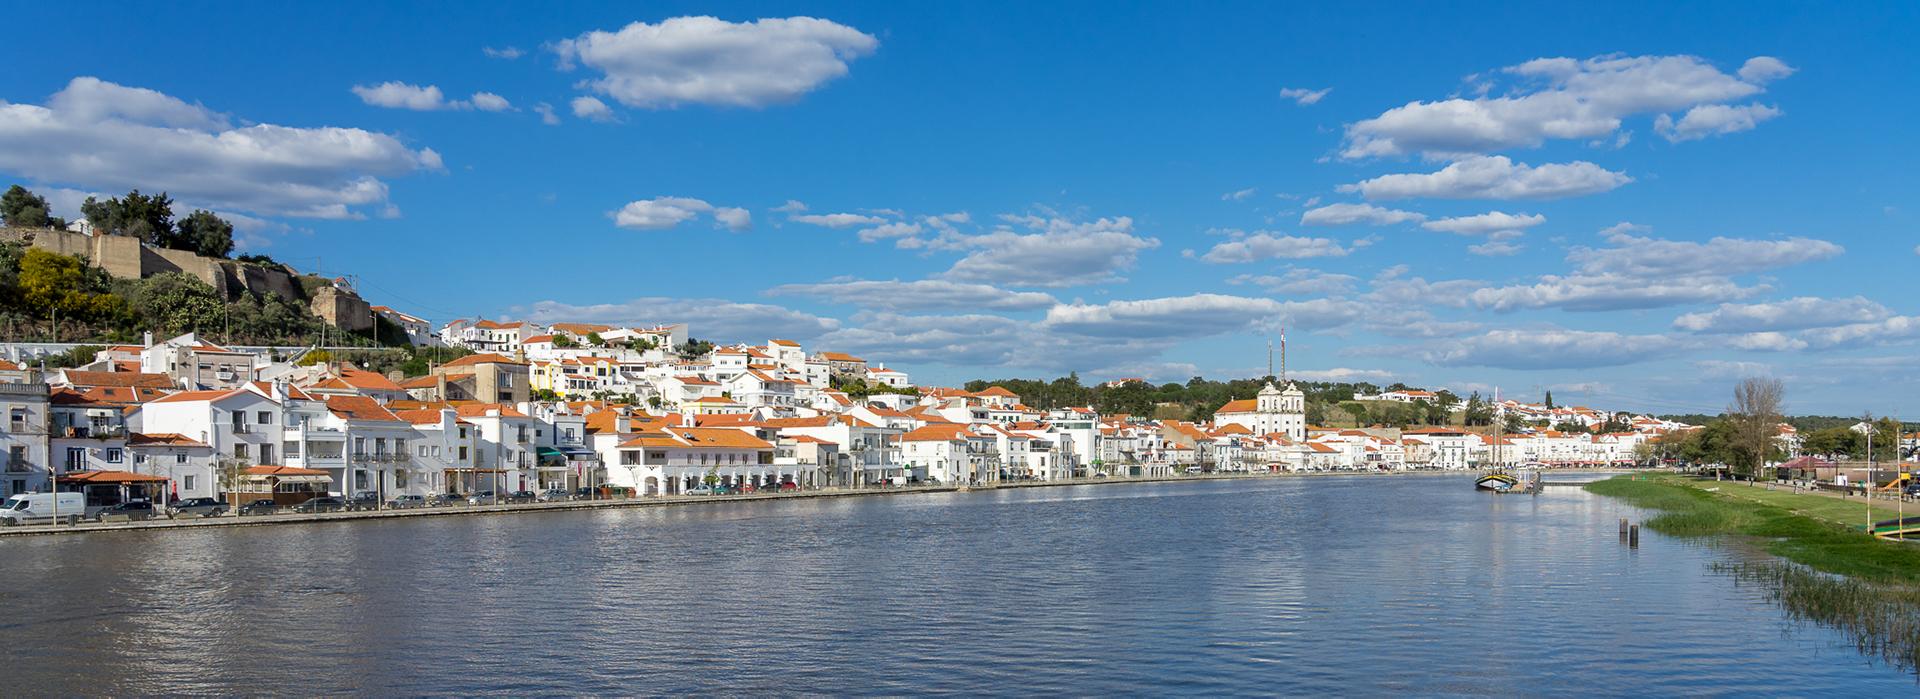 Portugal Bilder